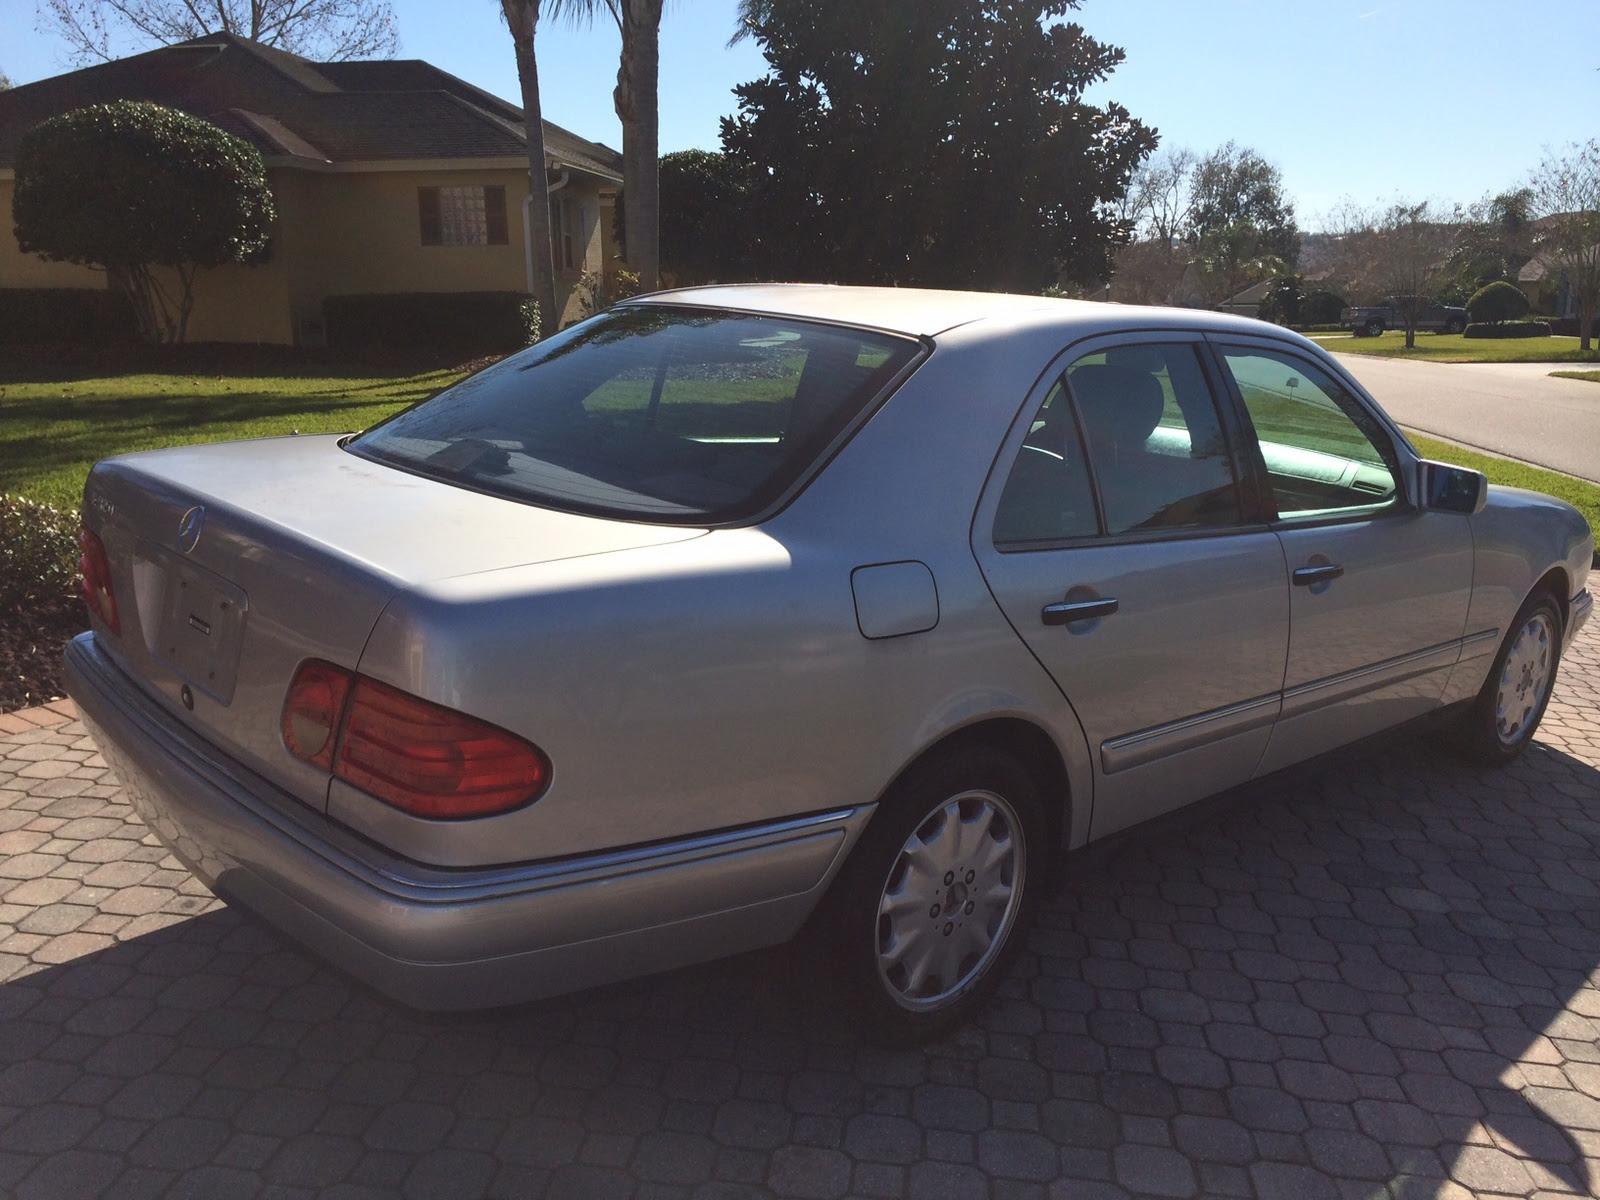 1996 Mercedes-Benz E-Class - Pictures - CarGurus